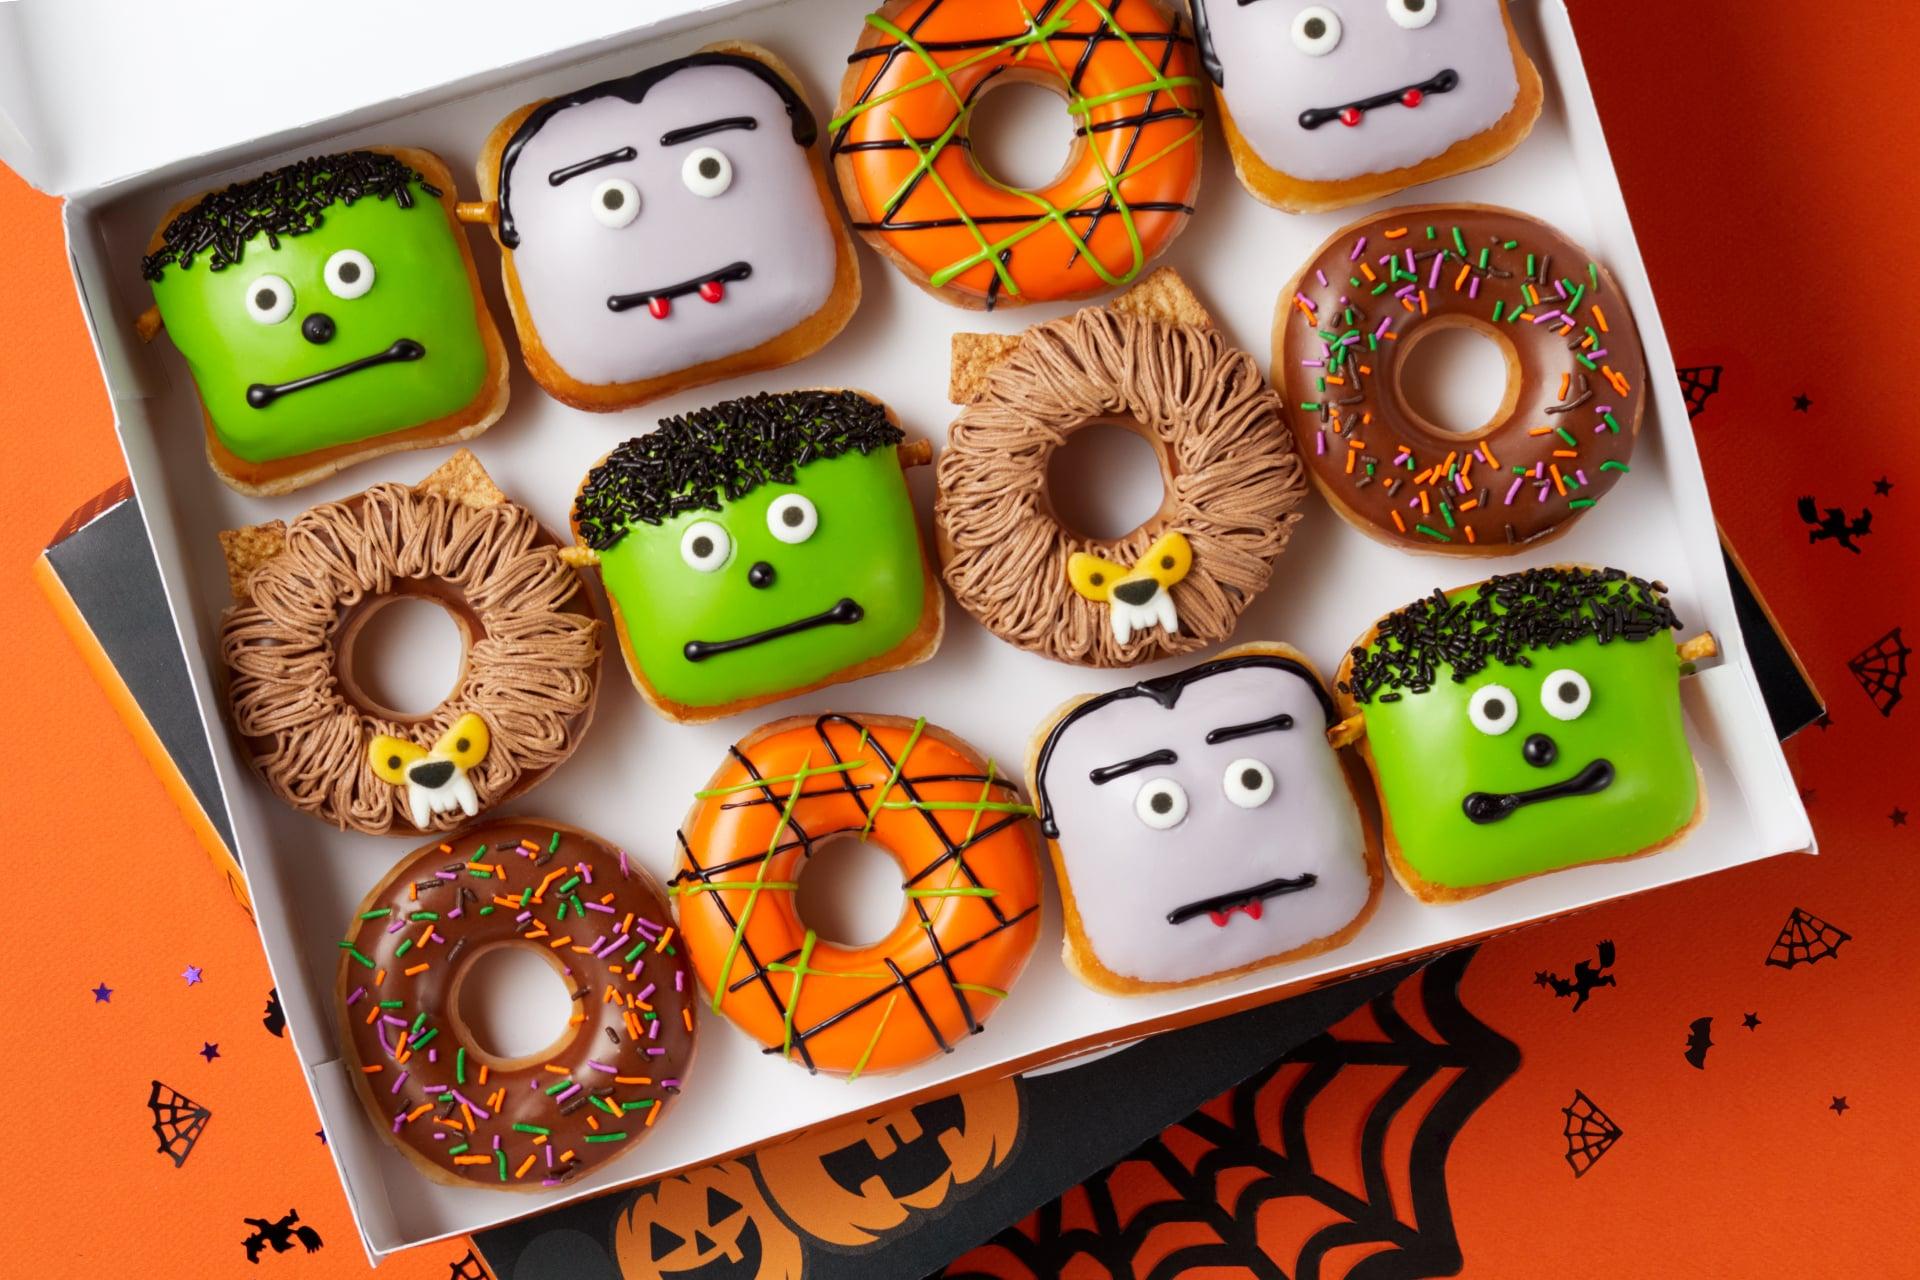 Krispy Kreme Halloween Doughnuts 2020 Flavors Krispy Kreme's Halloween Doughnuts 2020 | POPSUGAR Food